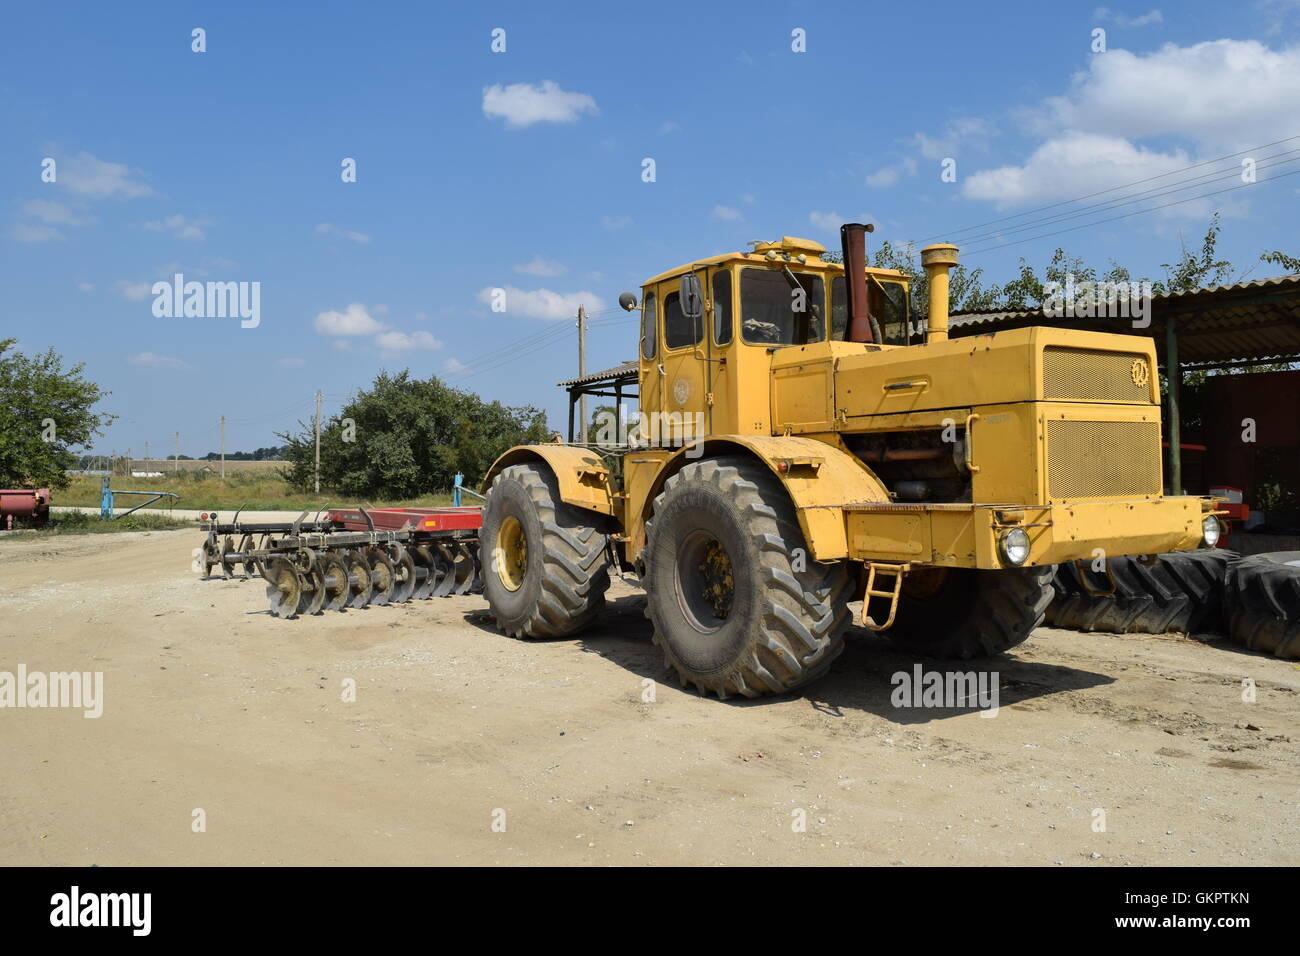 russland temrjuk 15 juli 2015 gro e gelbe traktor. Black Bedroom Furniture Sets. Home Design Ideas